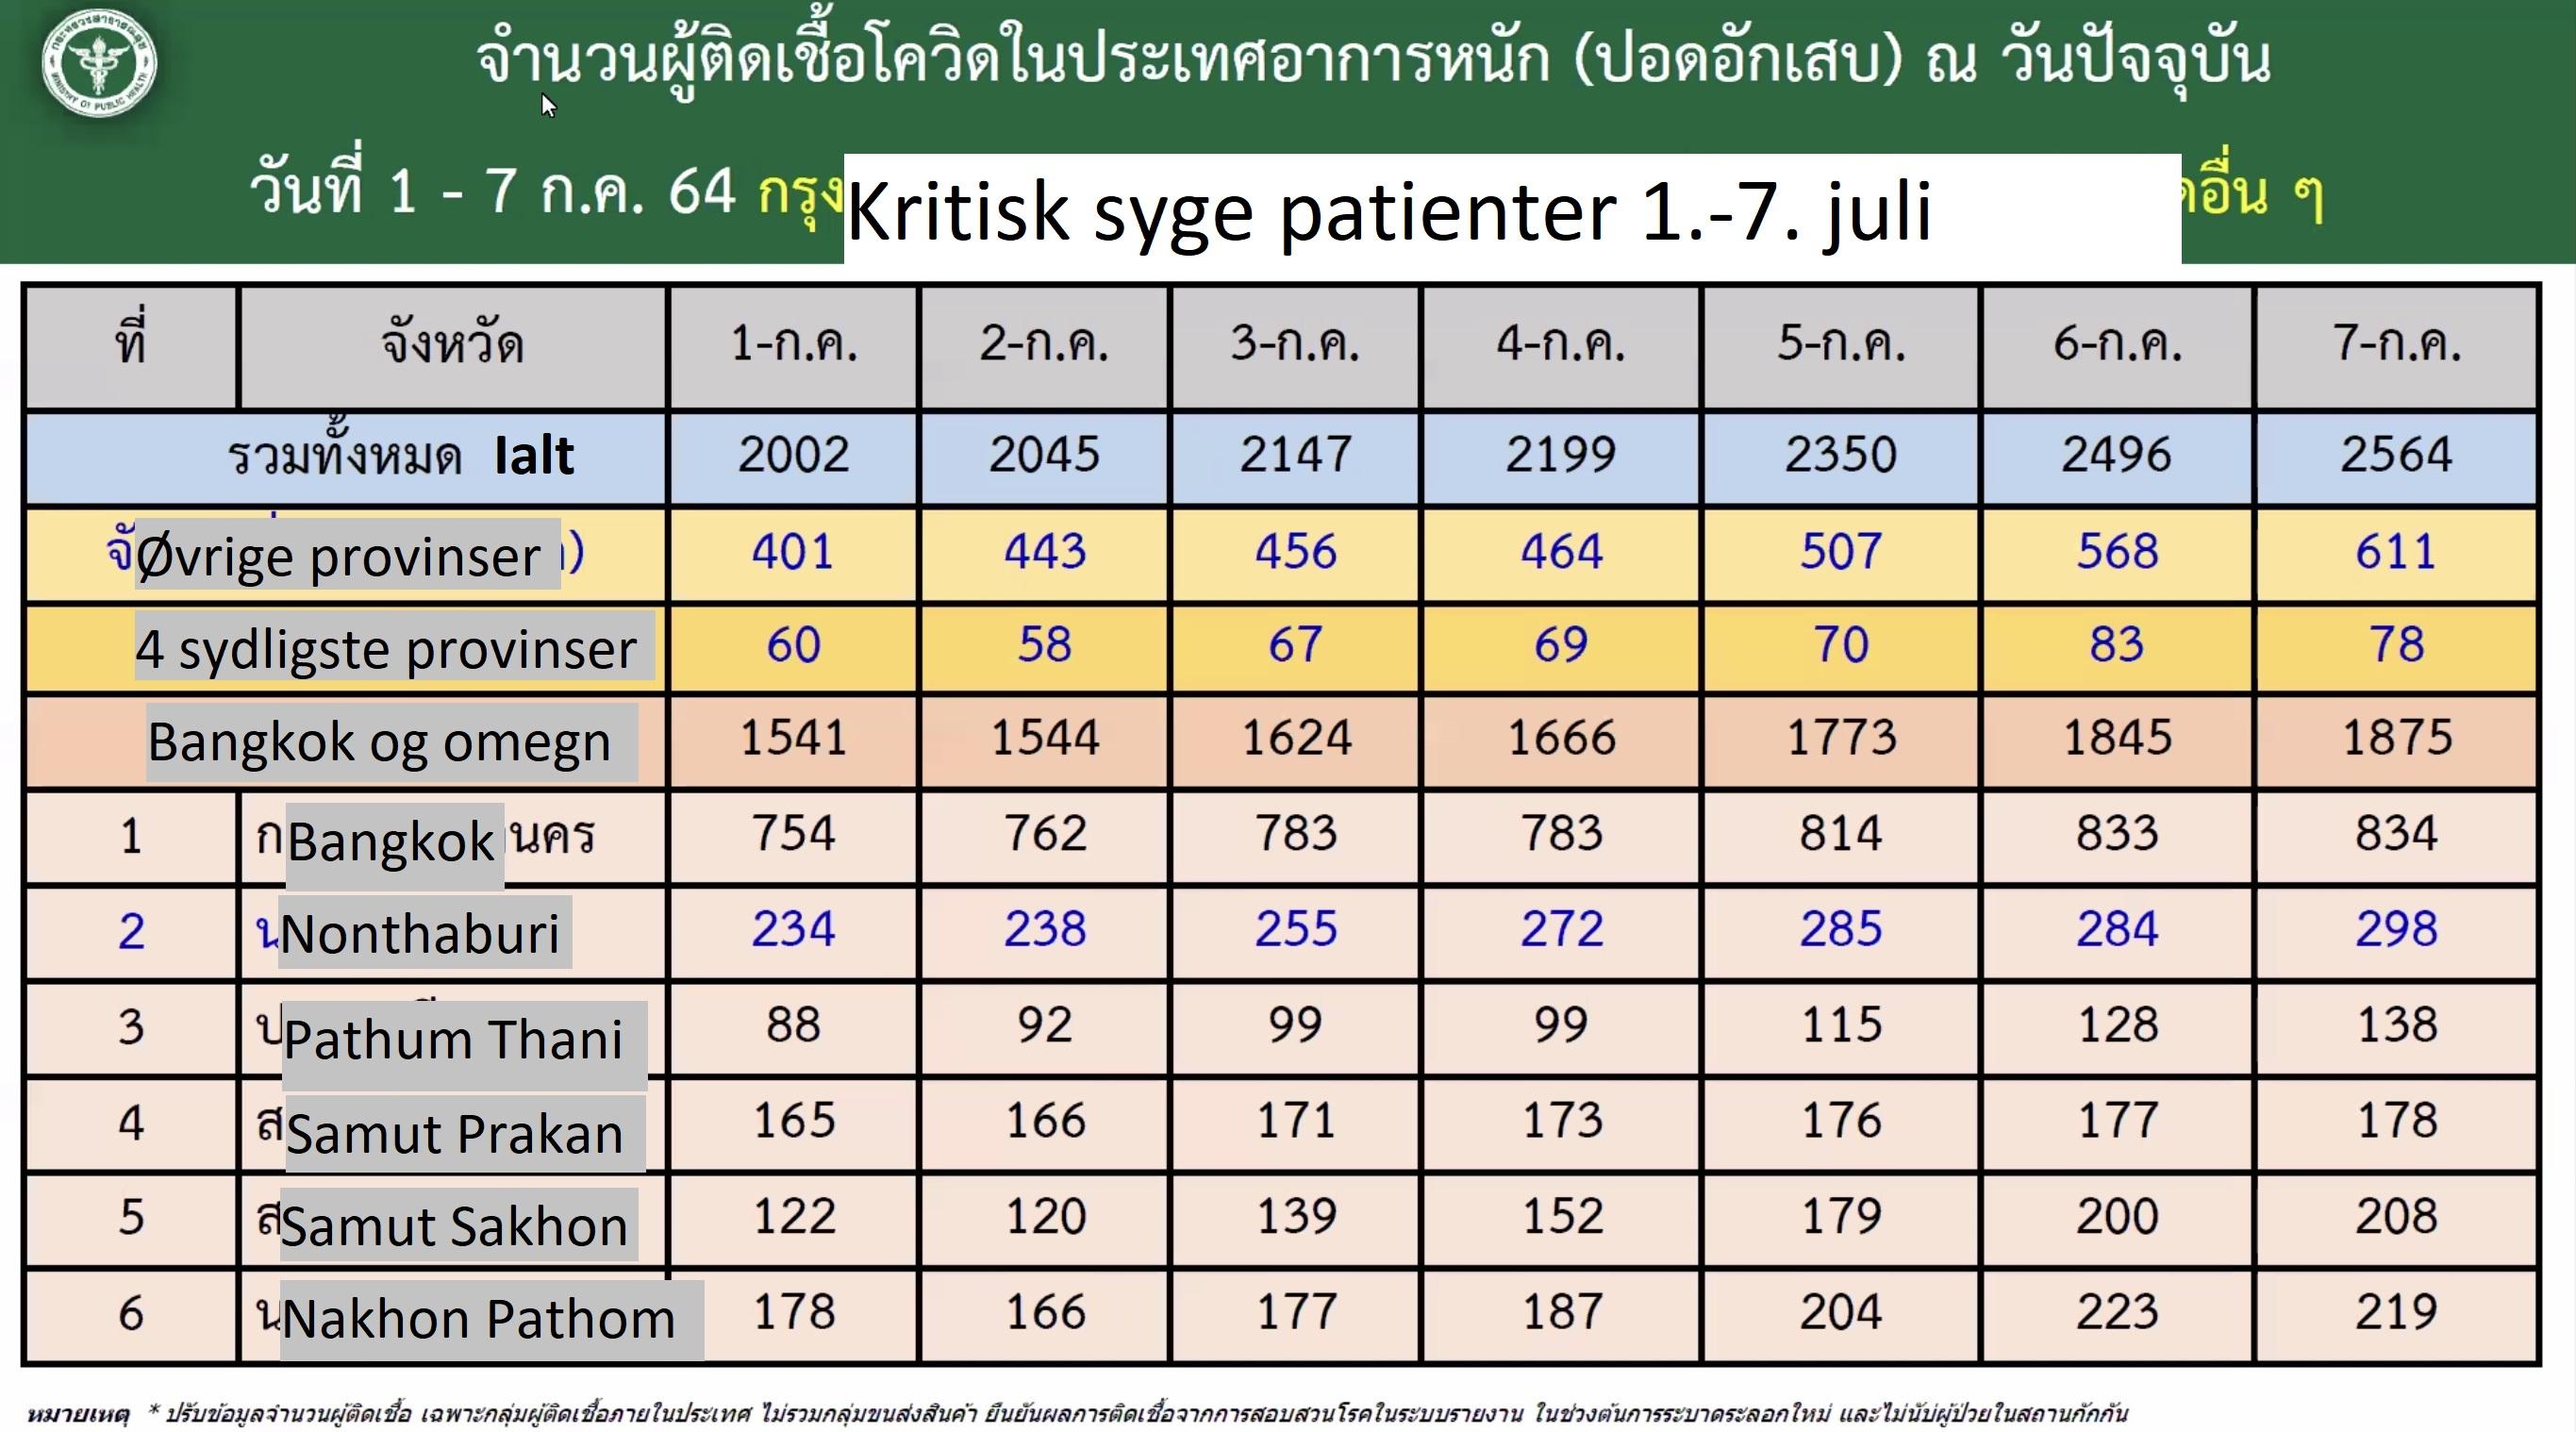 www.thaiguide.dk/images/forum/covid19/kritisk%20syge%20lobende%20r%2008-07-21.jpg